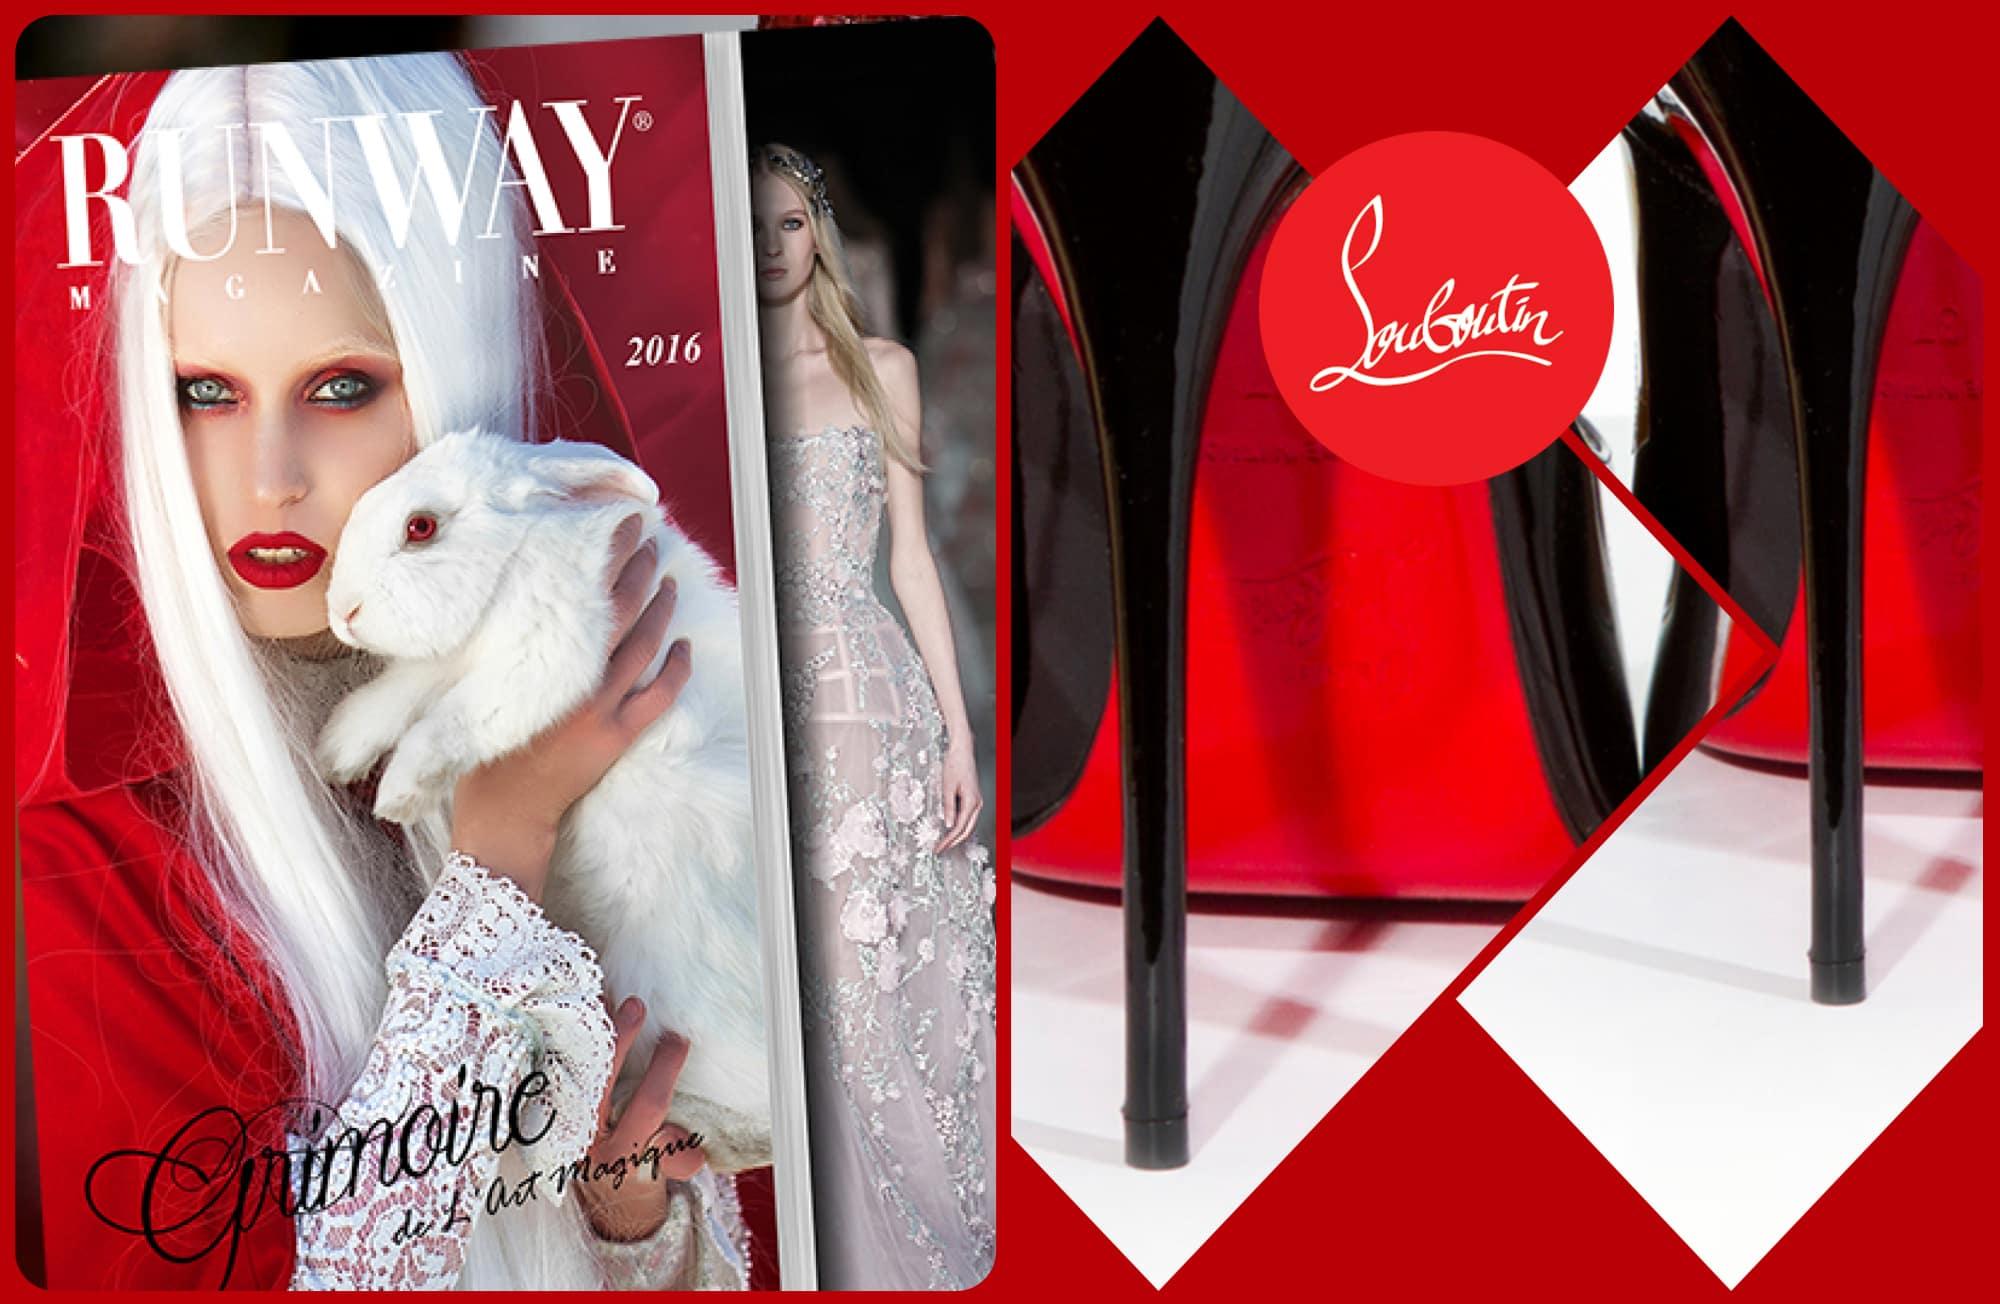 Runway-Magazine-Official-Address-HQ-Louboutin